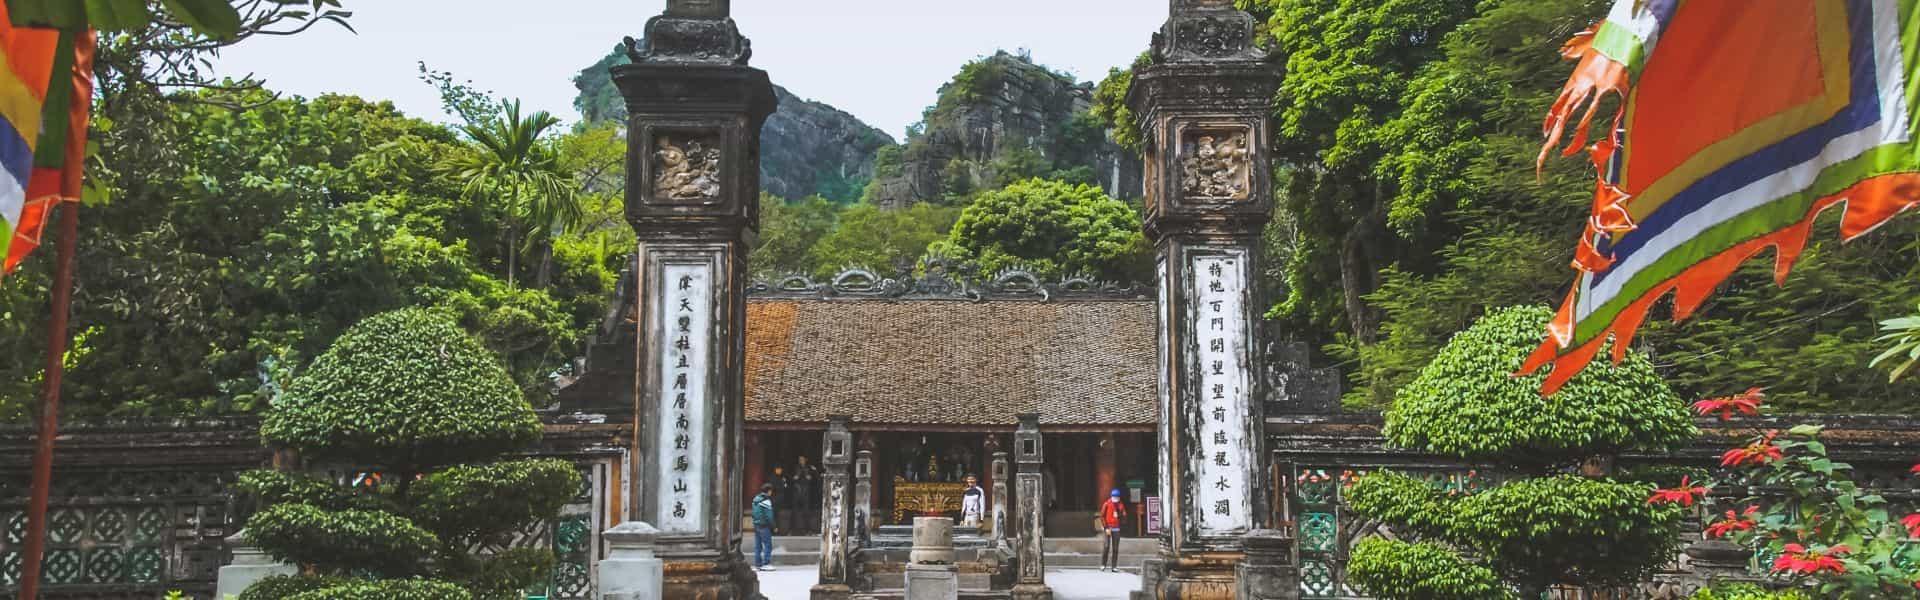 Ninh Binh Vietnam Attraction -  Dinh & Le Temples